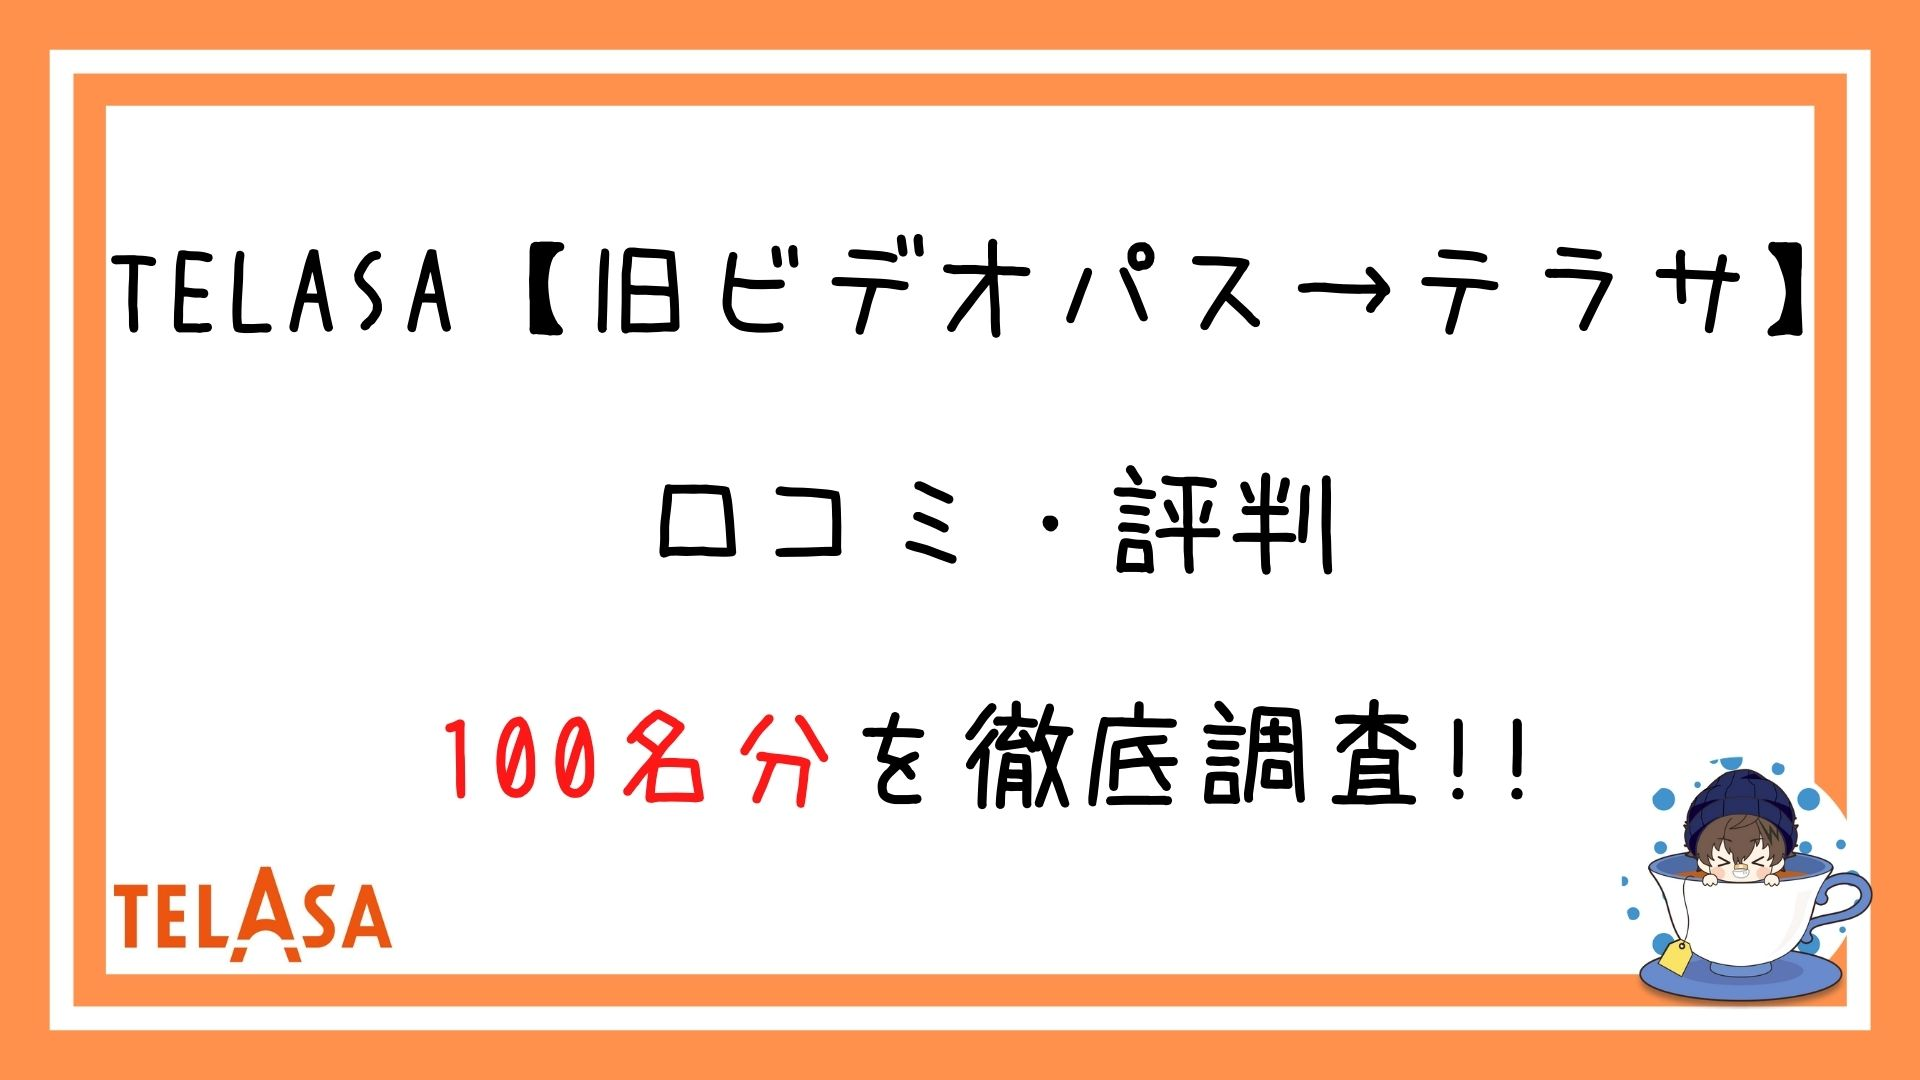 TELASA【旧ビデオパス→テラサ】の口コミ・評判、100名分を徹底調査!!